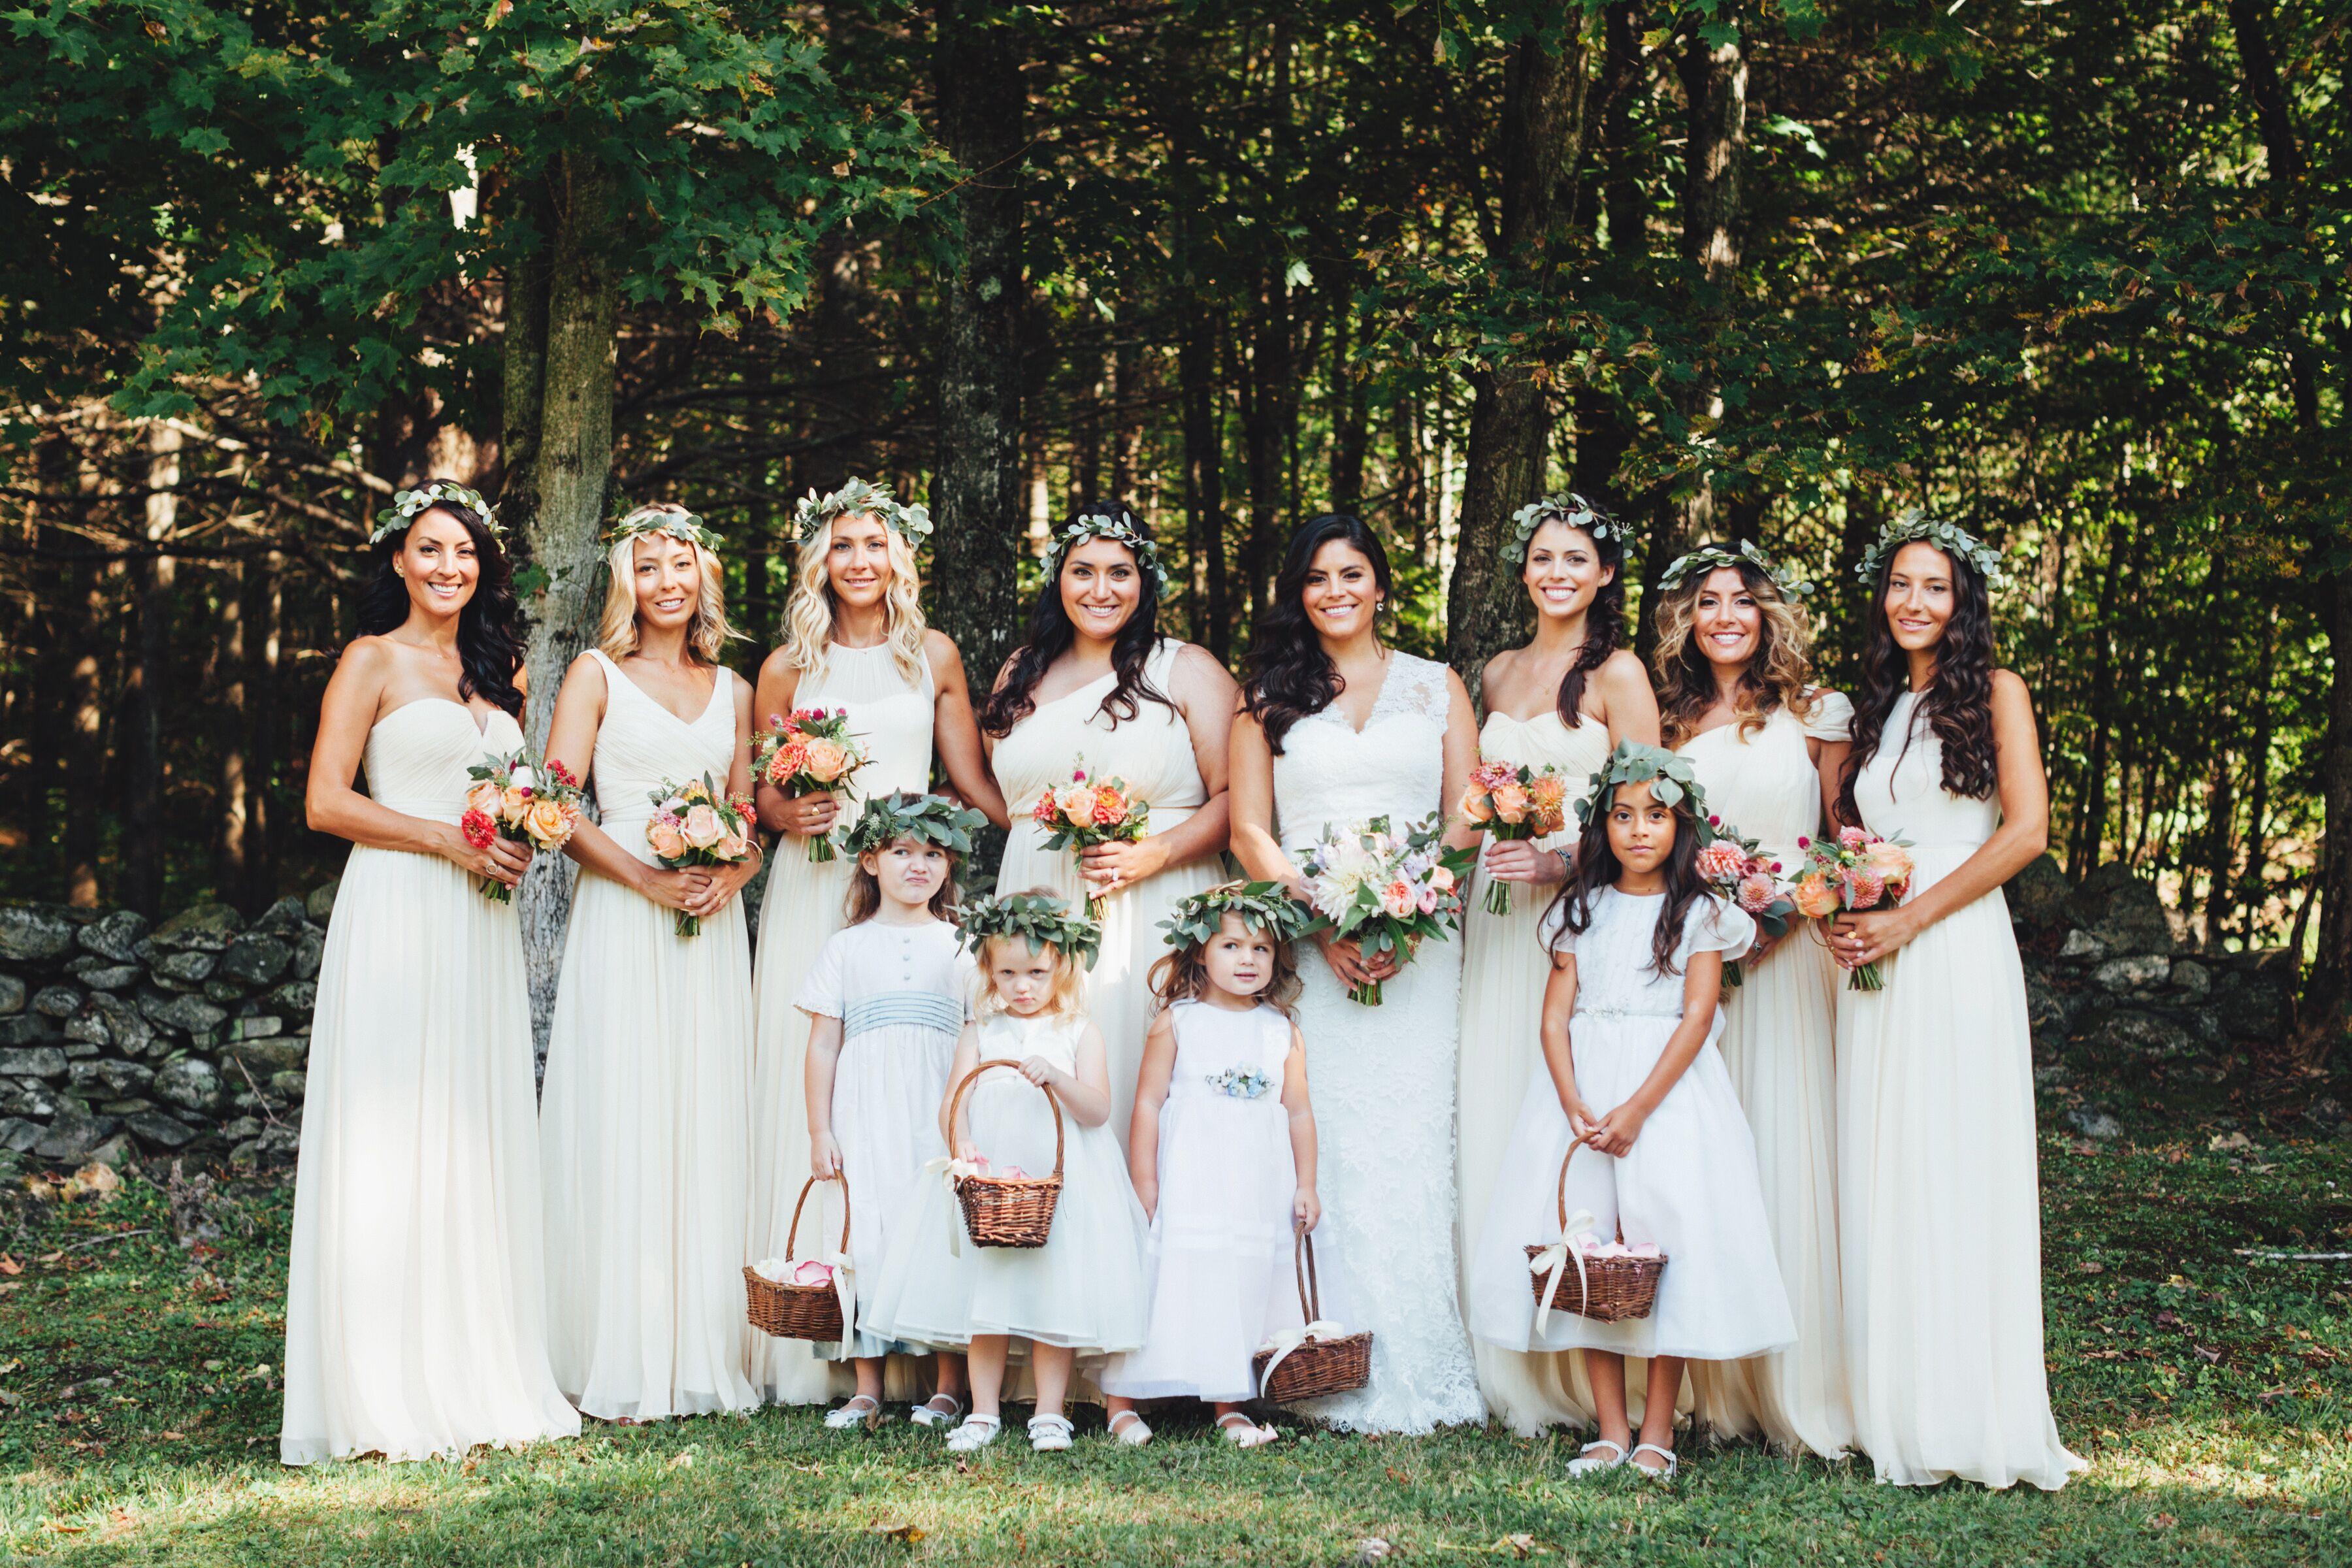 J.Crew Formal Ivory Bridesmaid Dresses